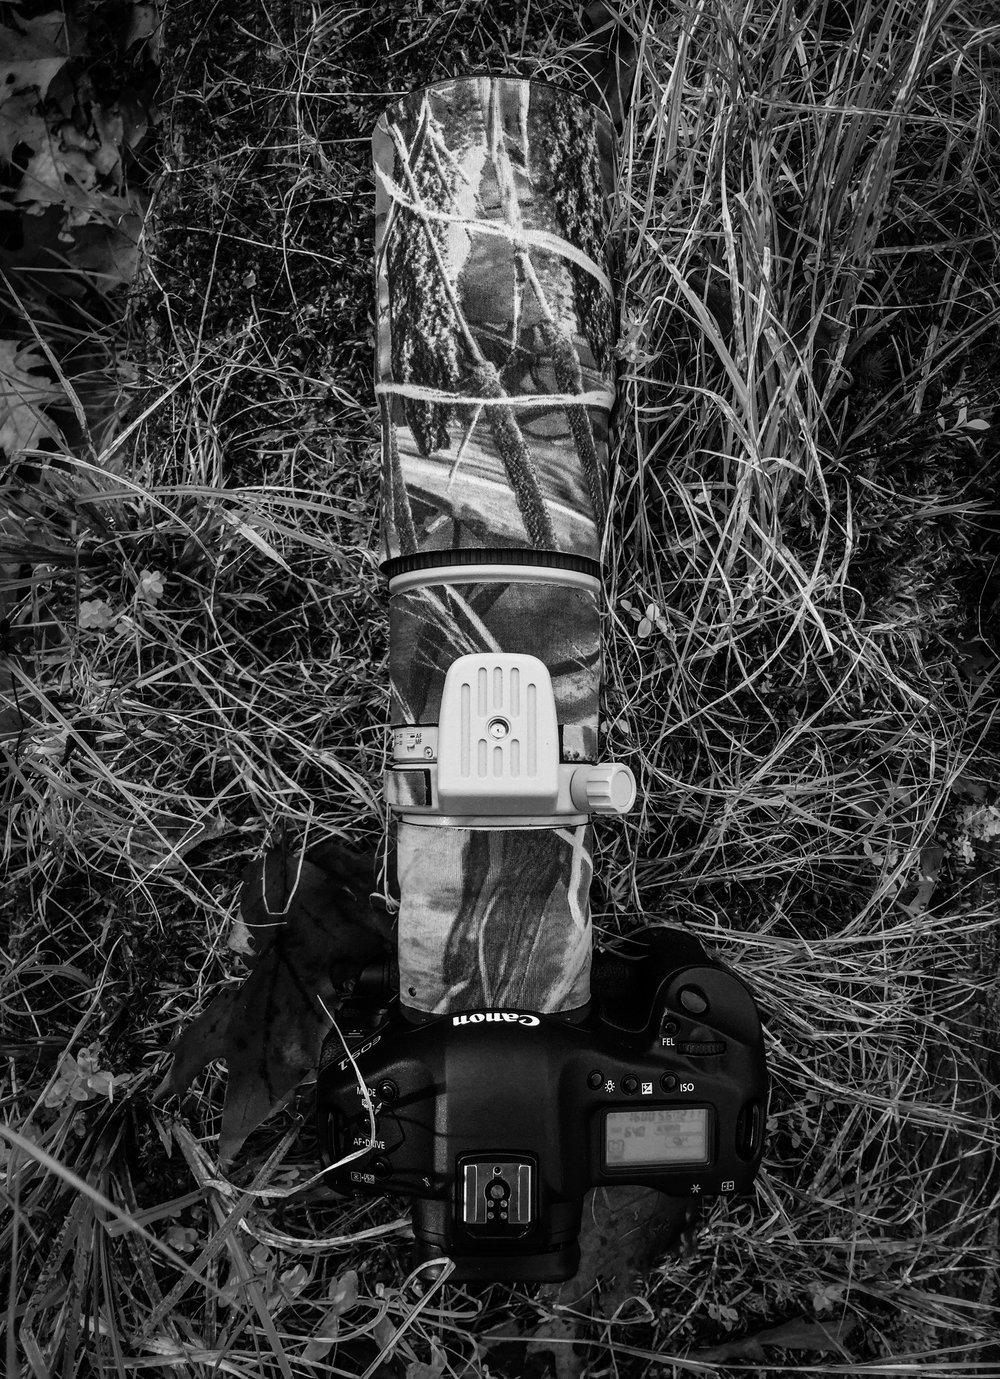 Camera and lens.jpg